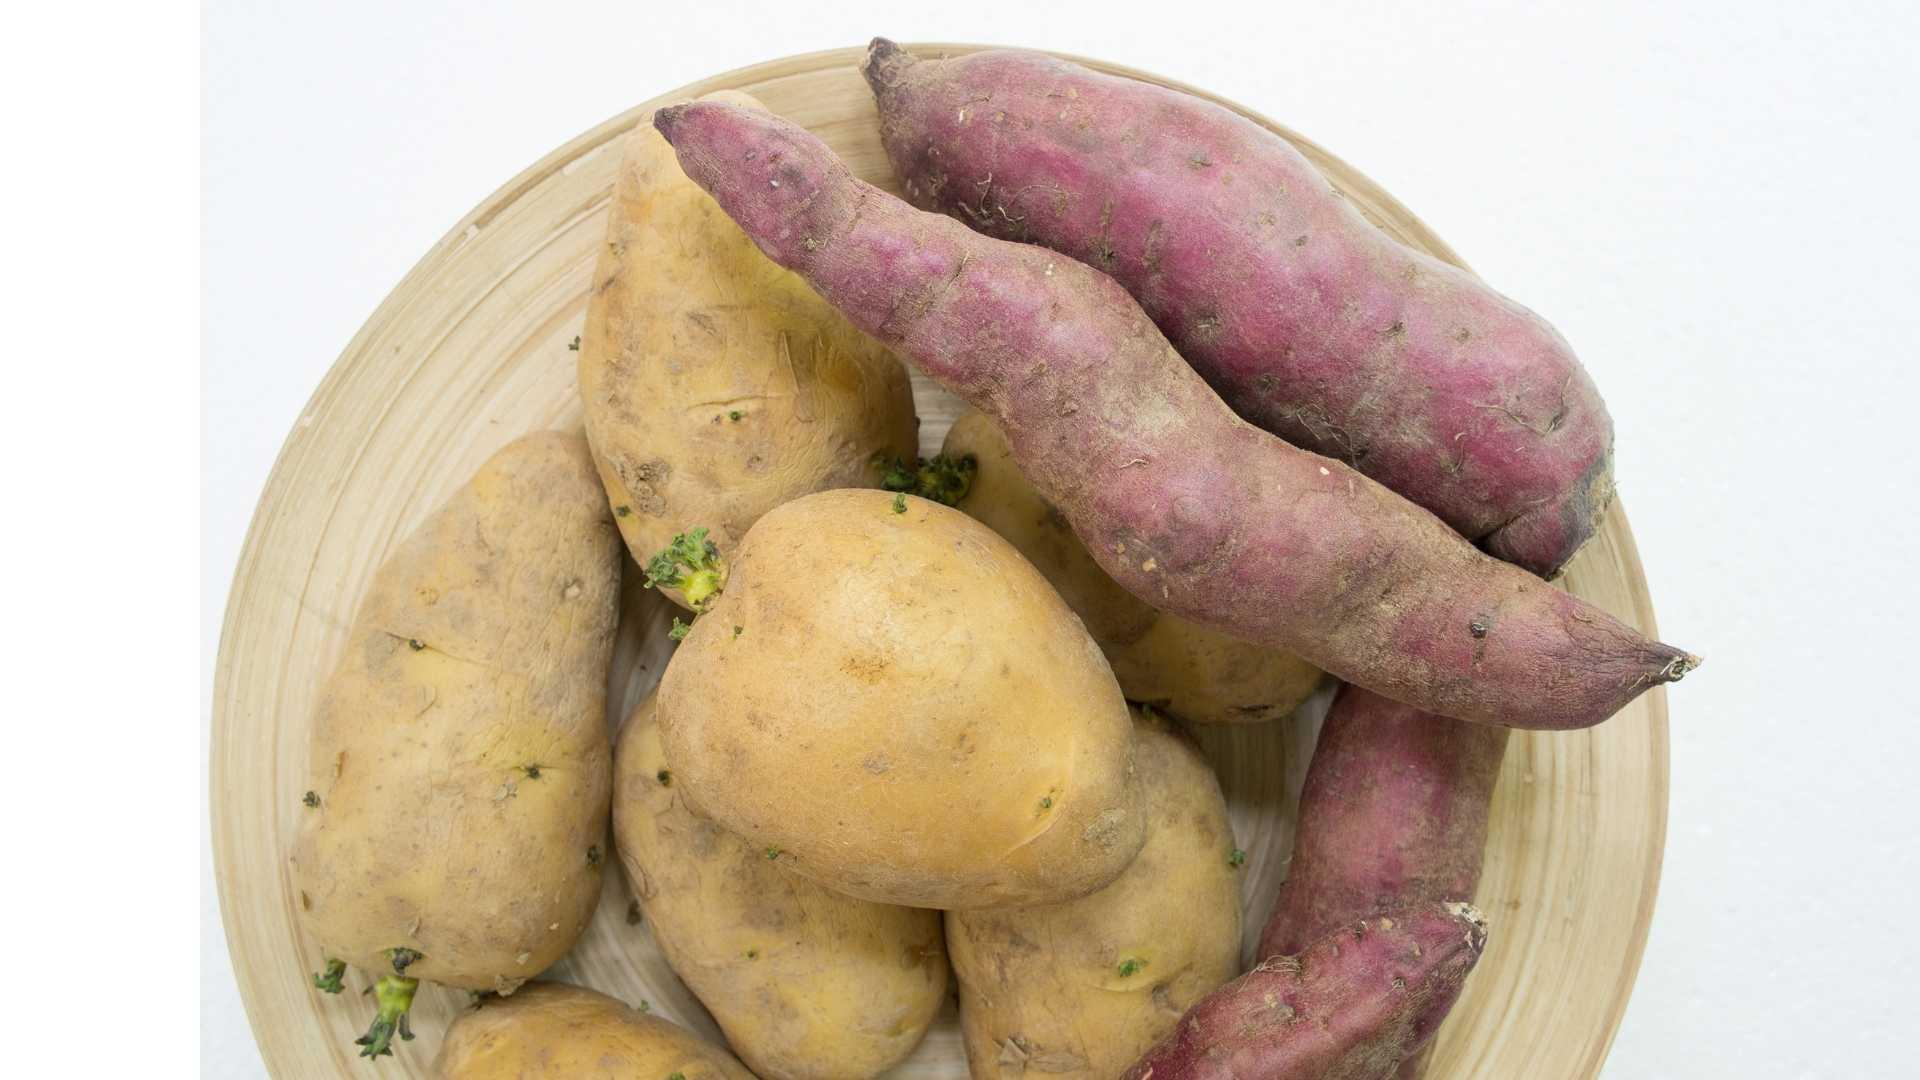 Dürfen Hunde Kartoffeln fressen?